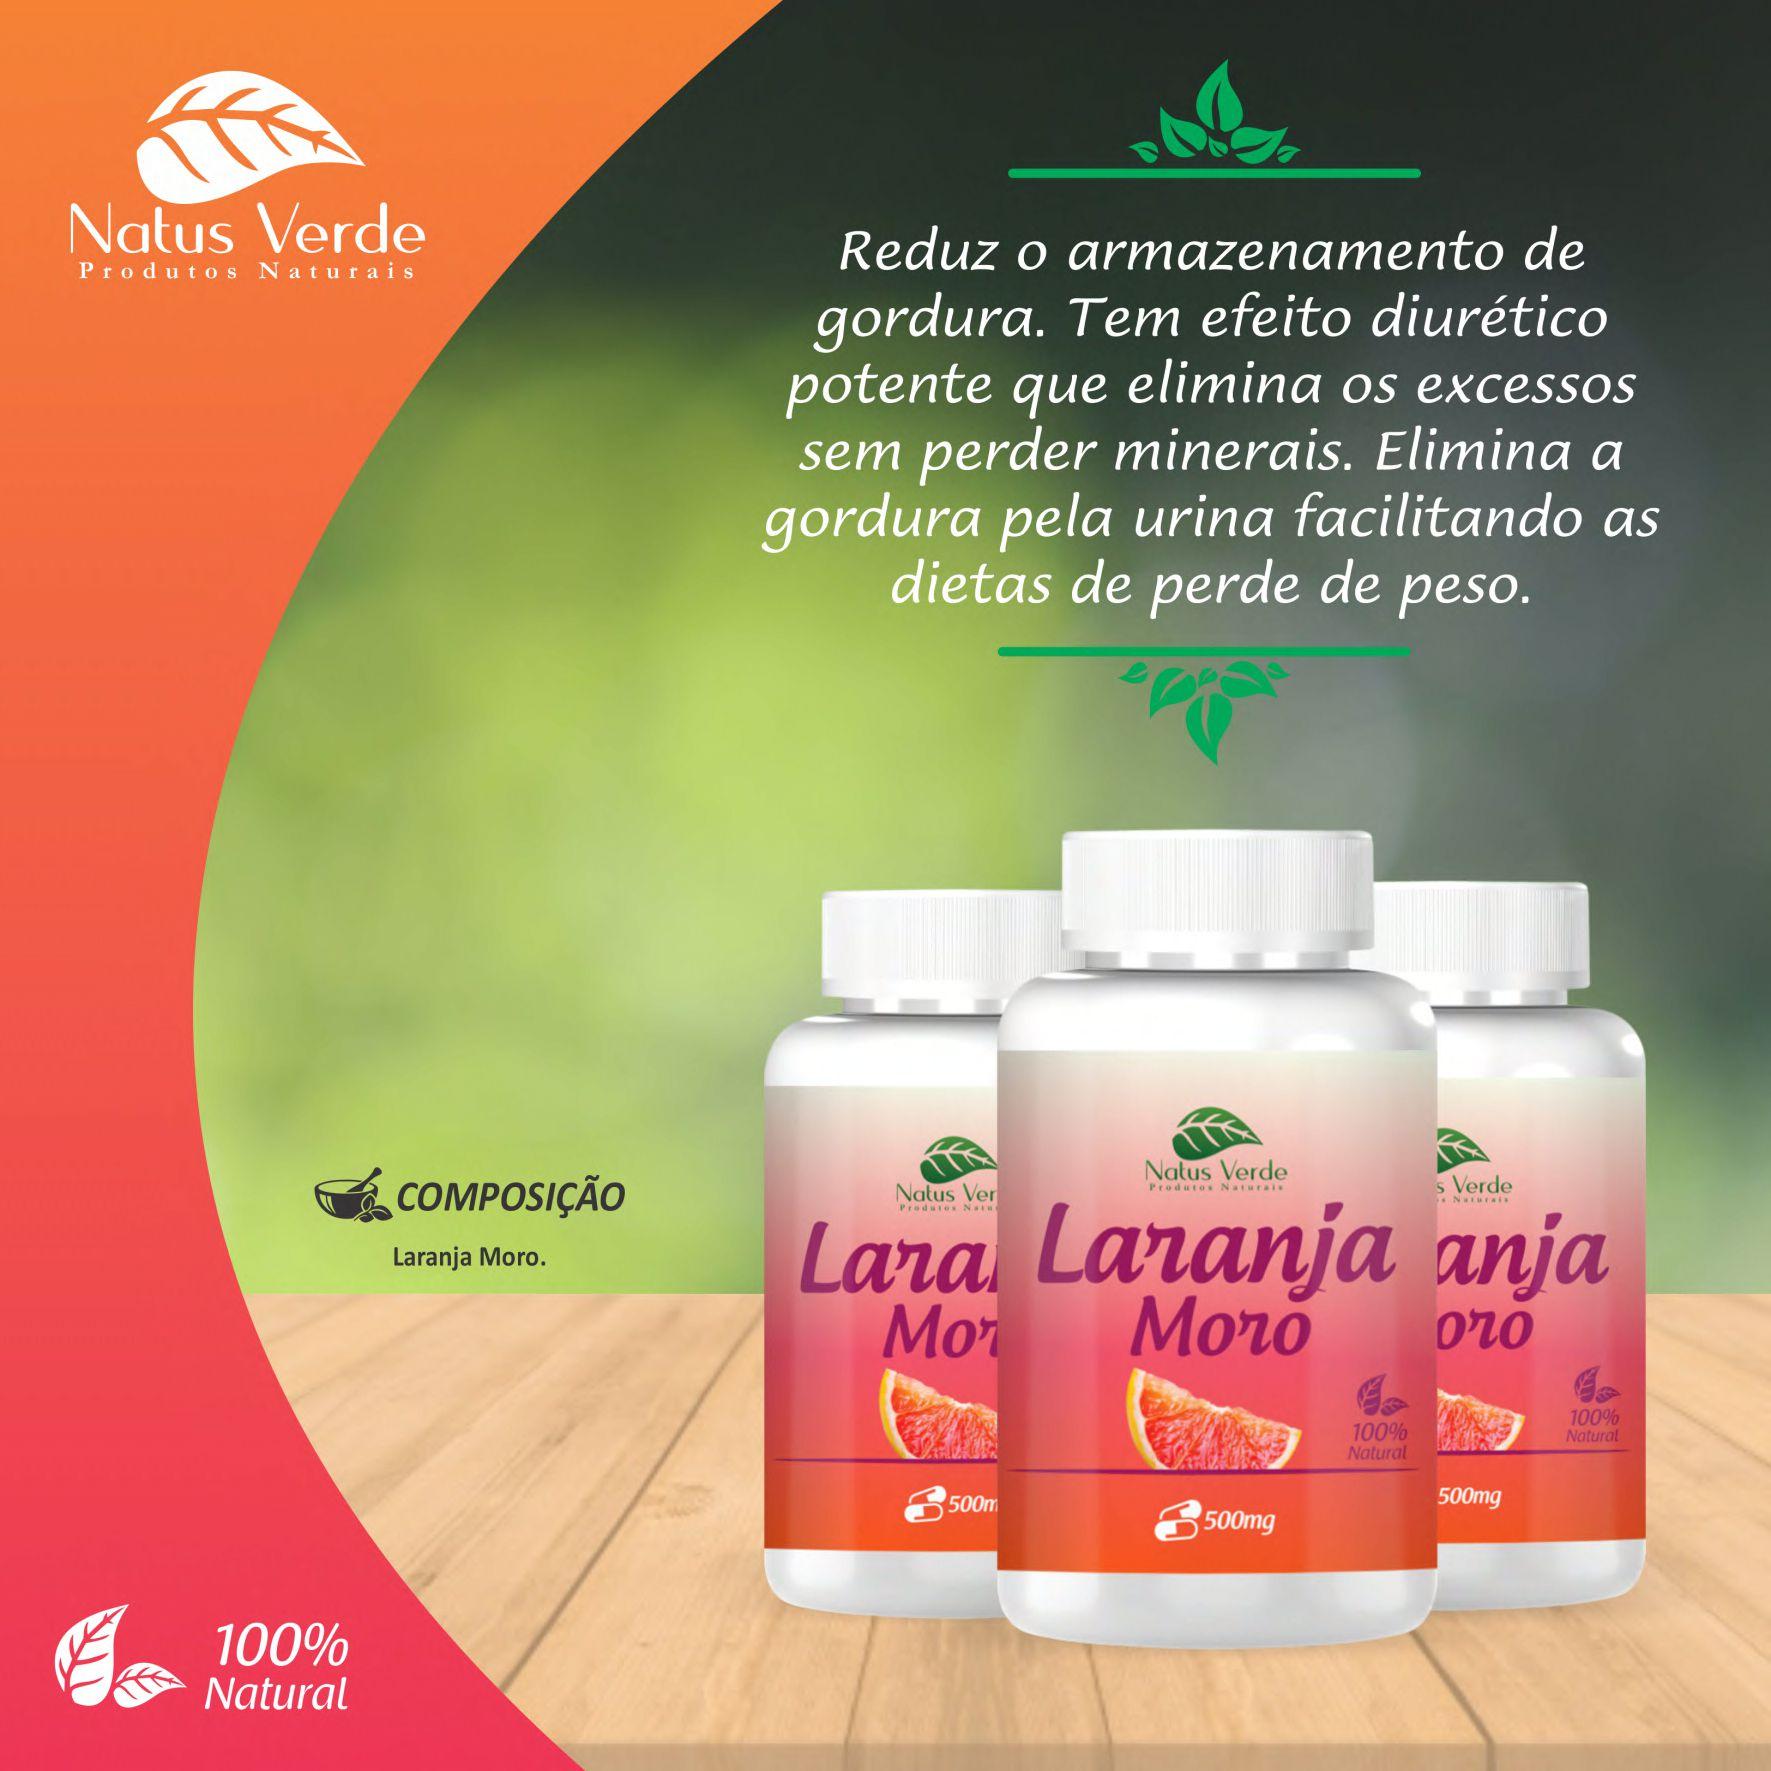 Queima Gordura Laranja Moro Natus Verde  - Fribasex - Fabricasex.com